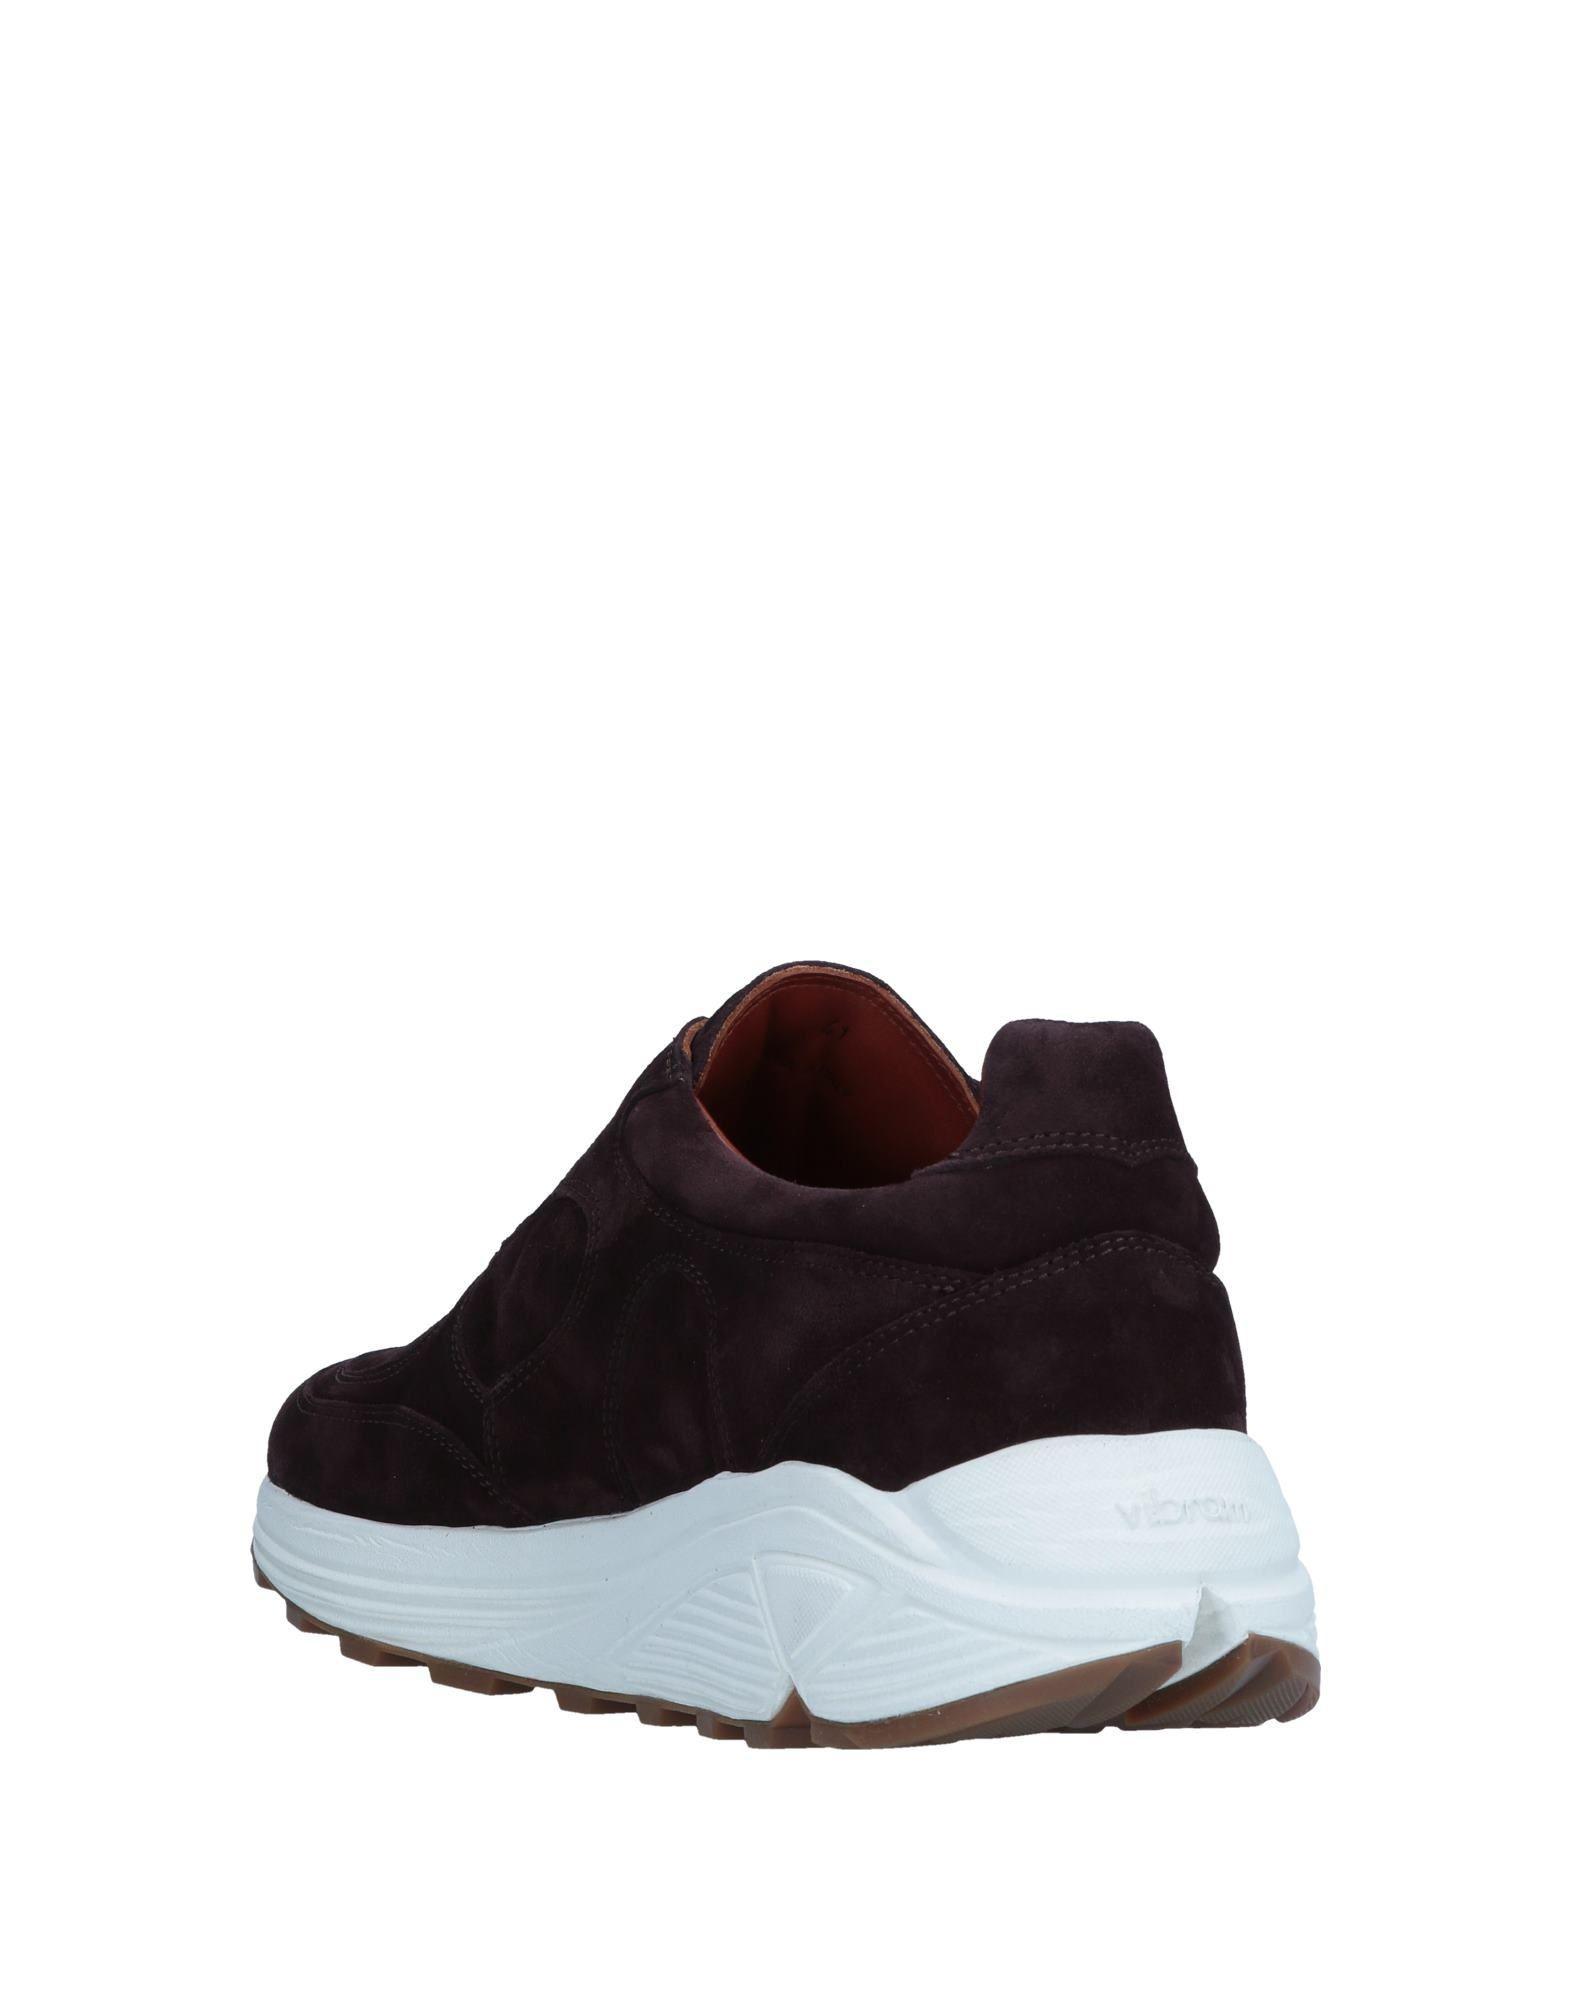 6db01abaa7cfe1 Lyst - Missoni Low-tops   Sneakers in Brown for Men